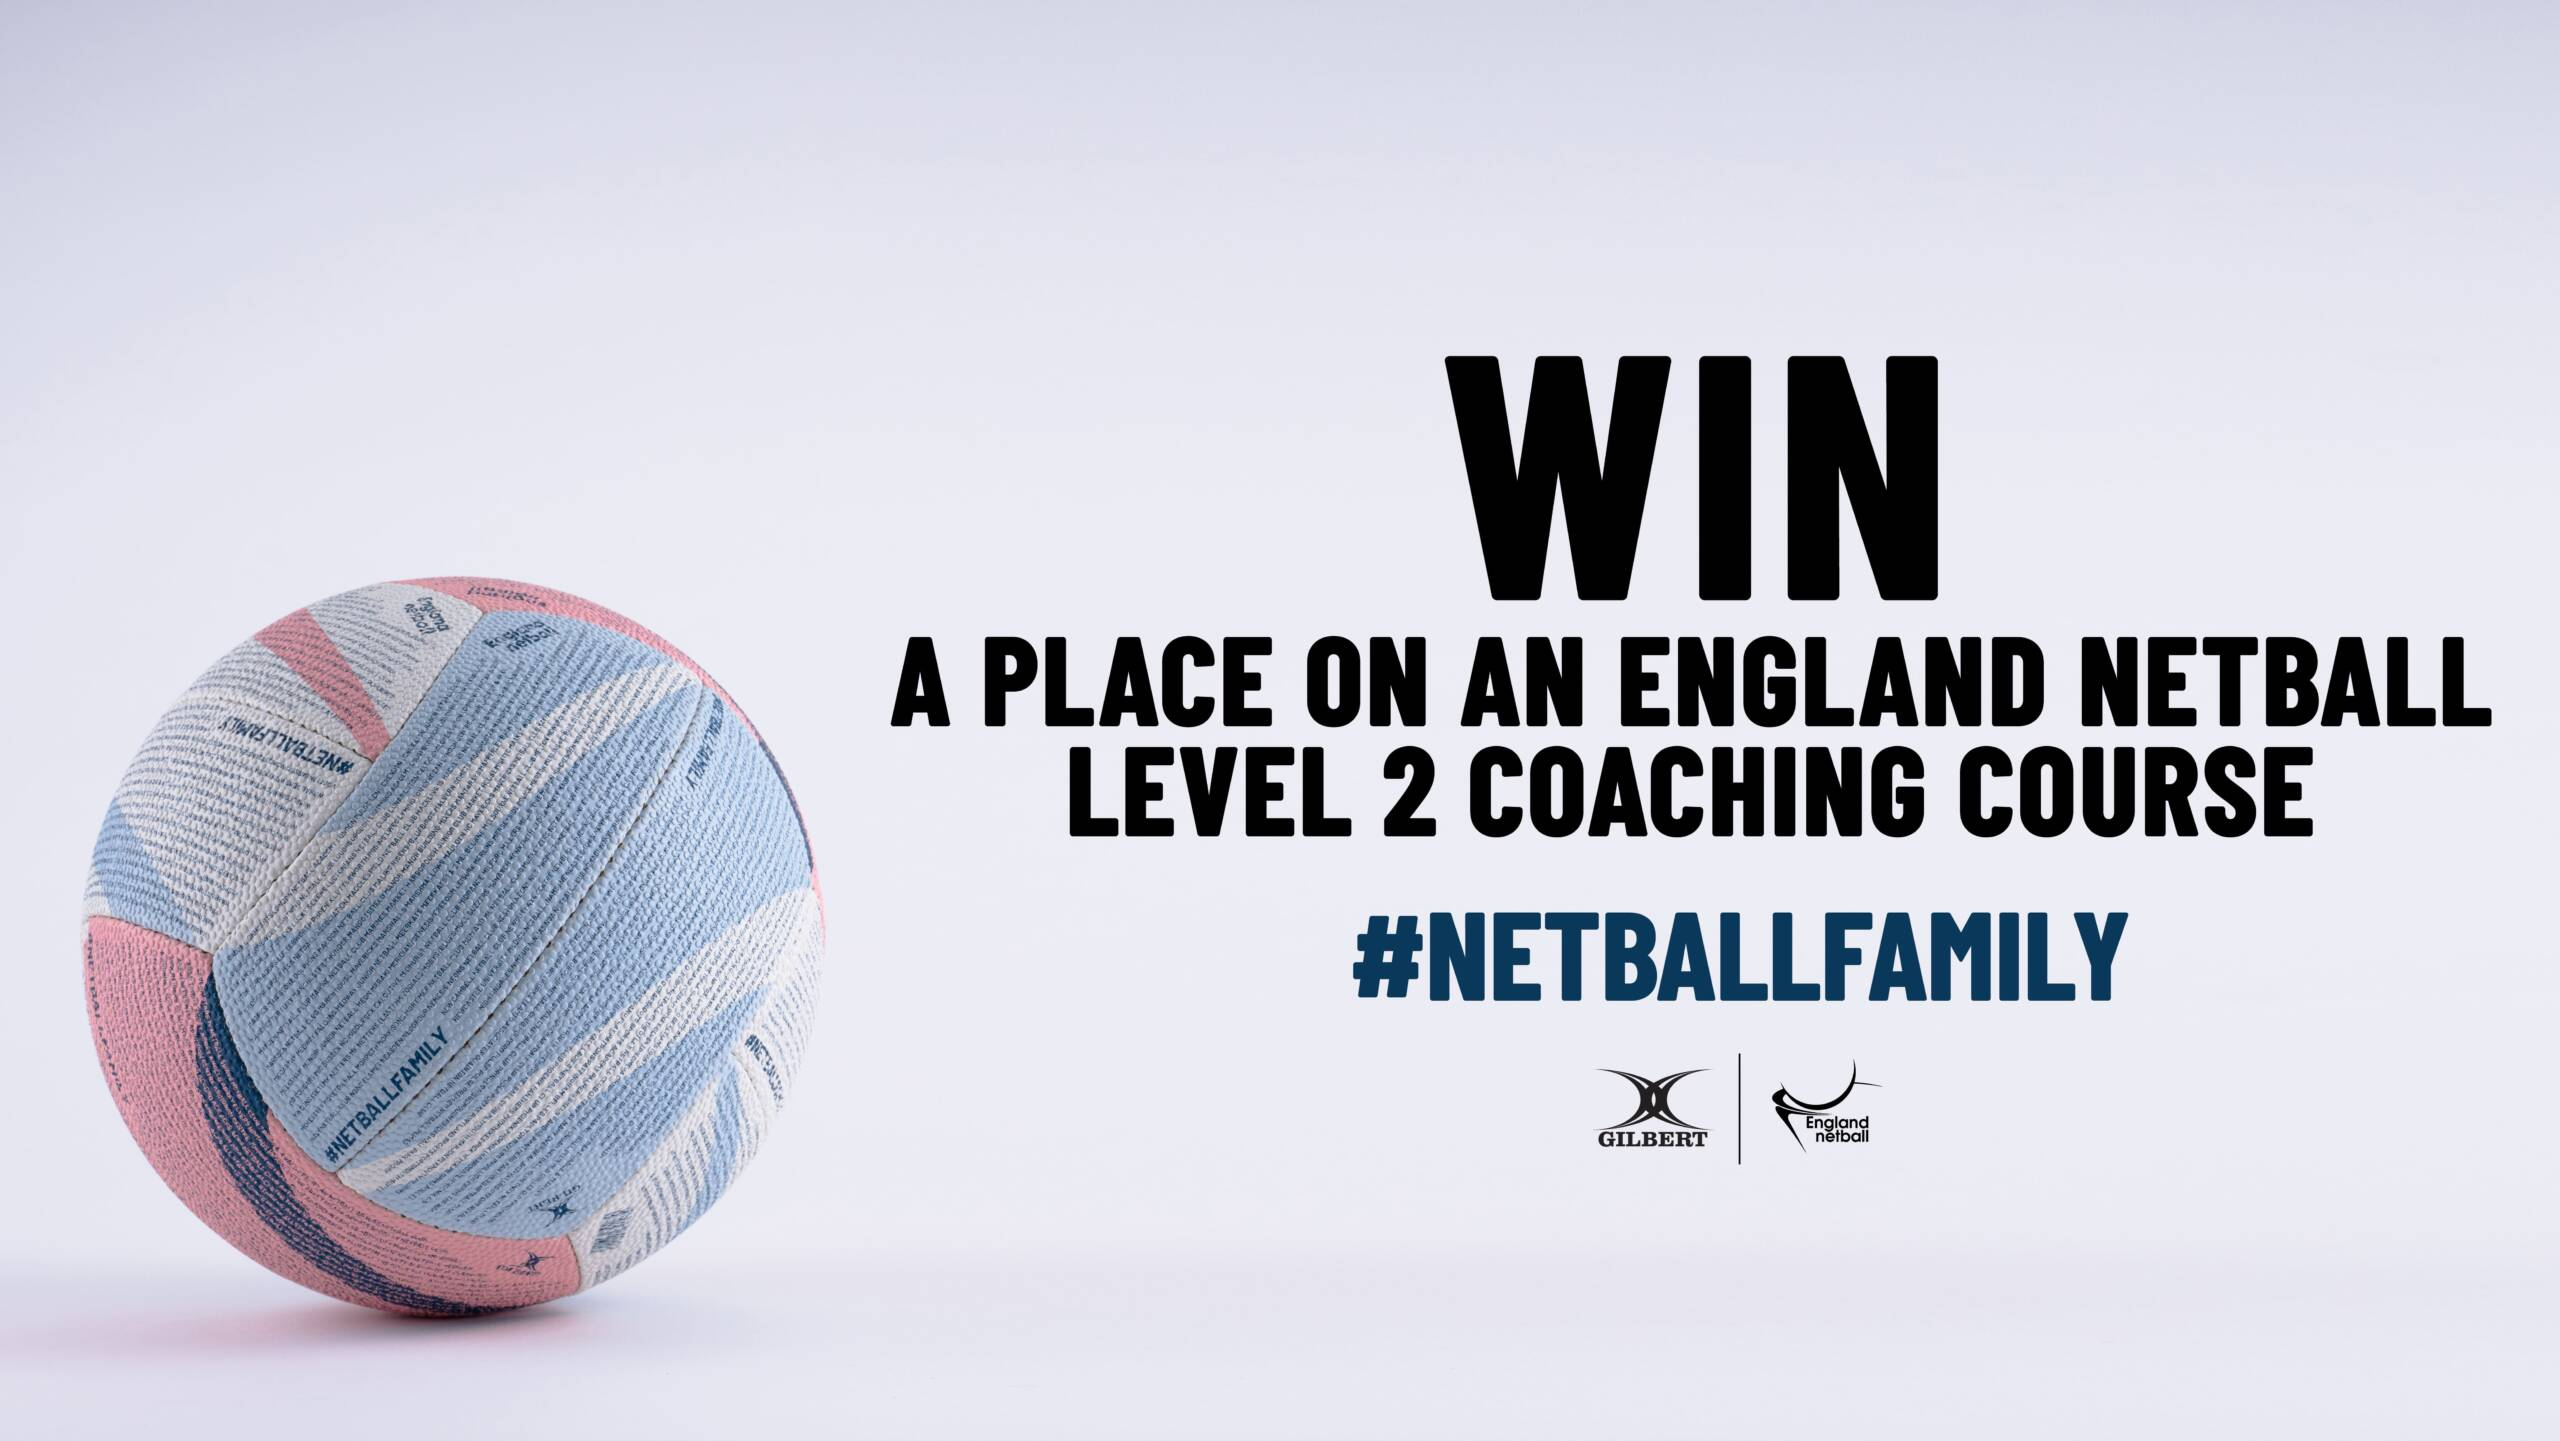 Applications open forEngland Netball Level 2coachingcoursefunding